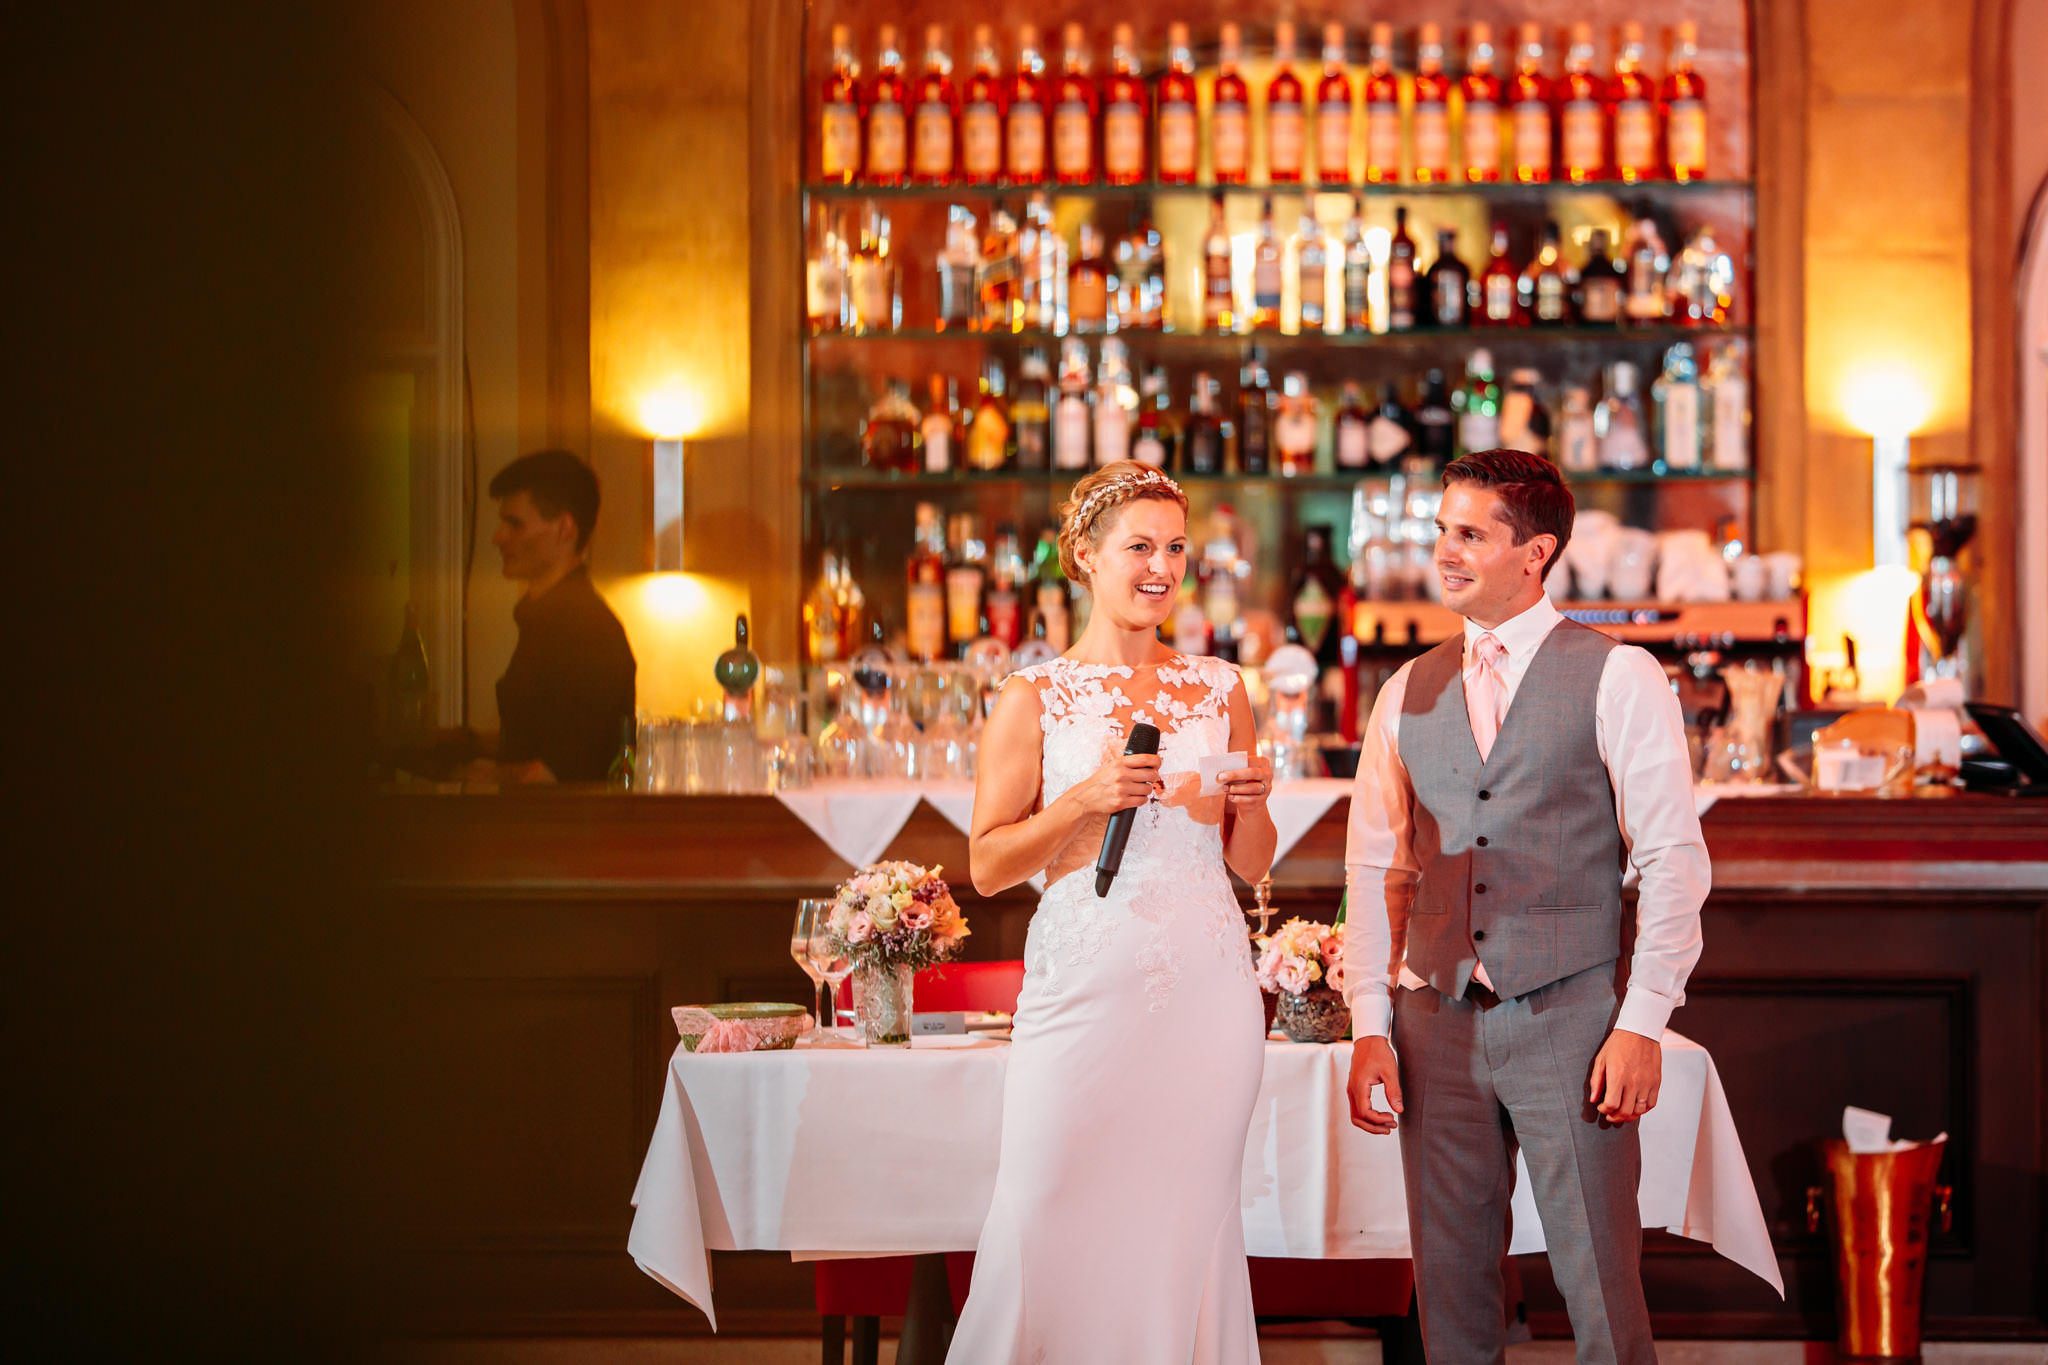 180818_Hochzeit_german_american_grunewald_berlin_locanda_12_apostoli_wedding_web_0021.jpg